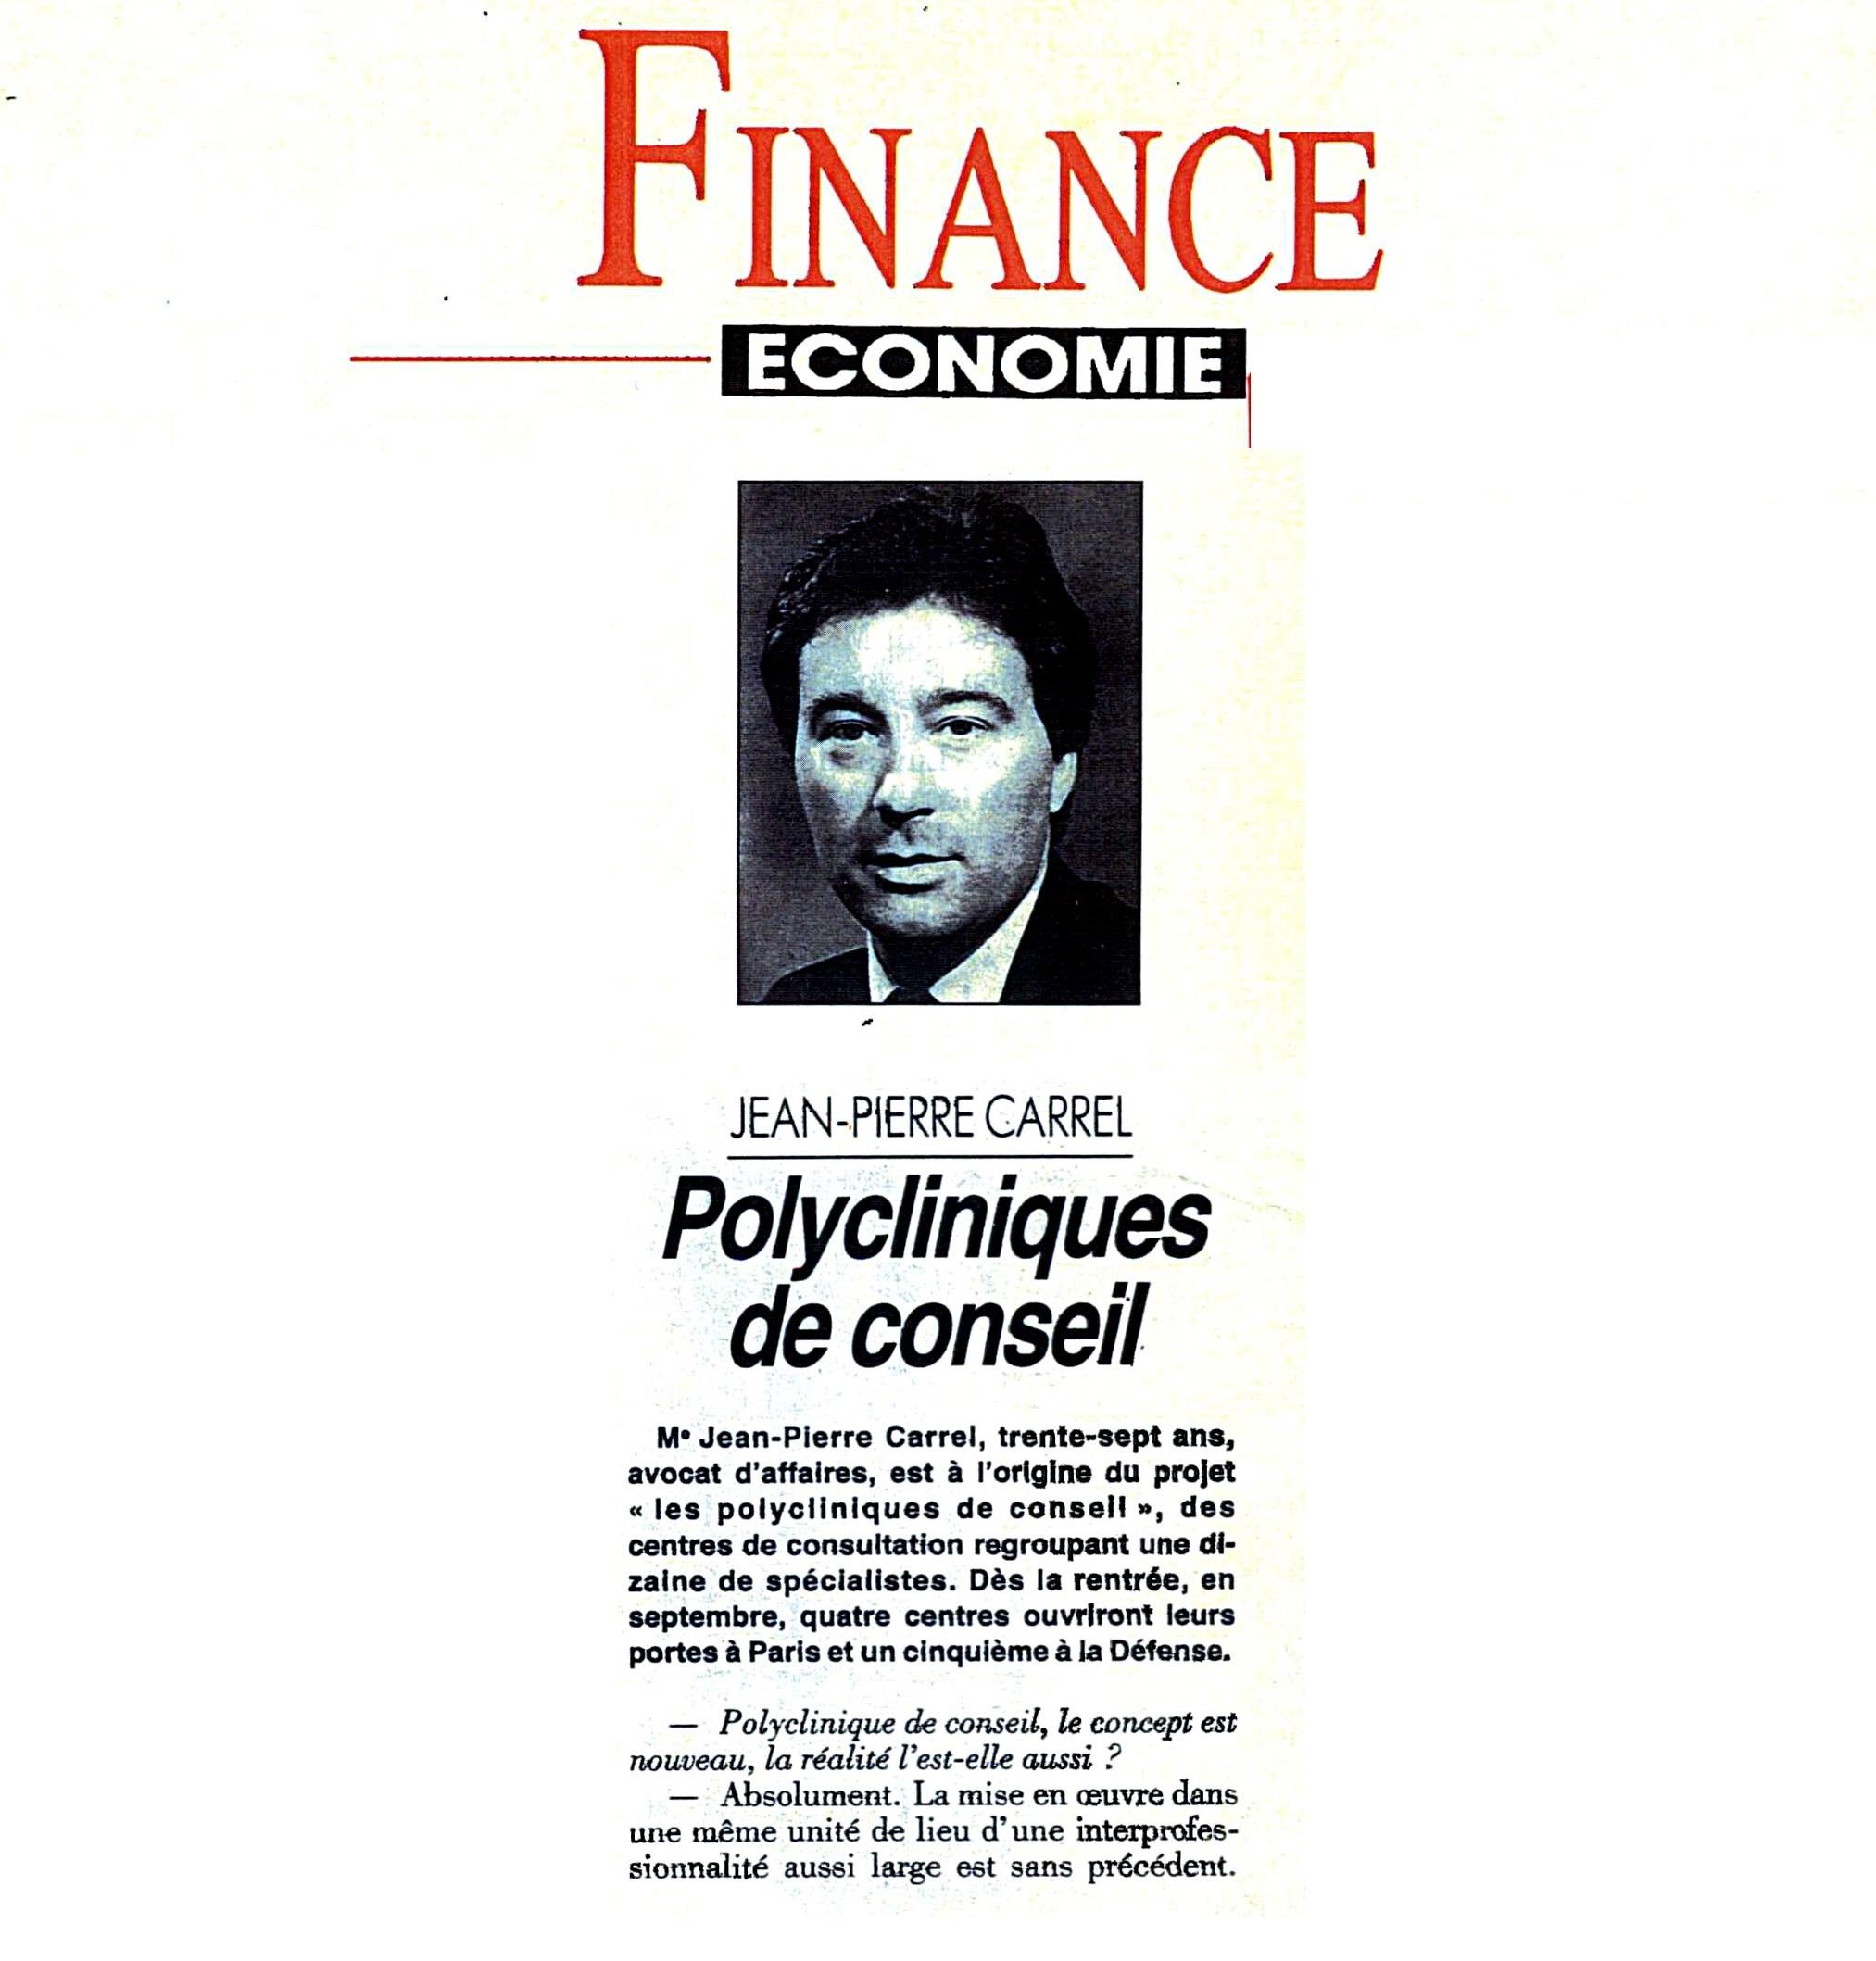 Finance-Economie